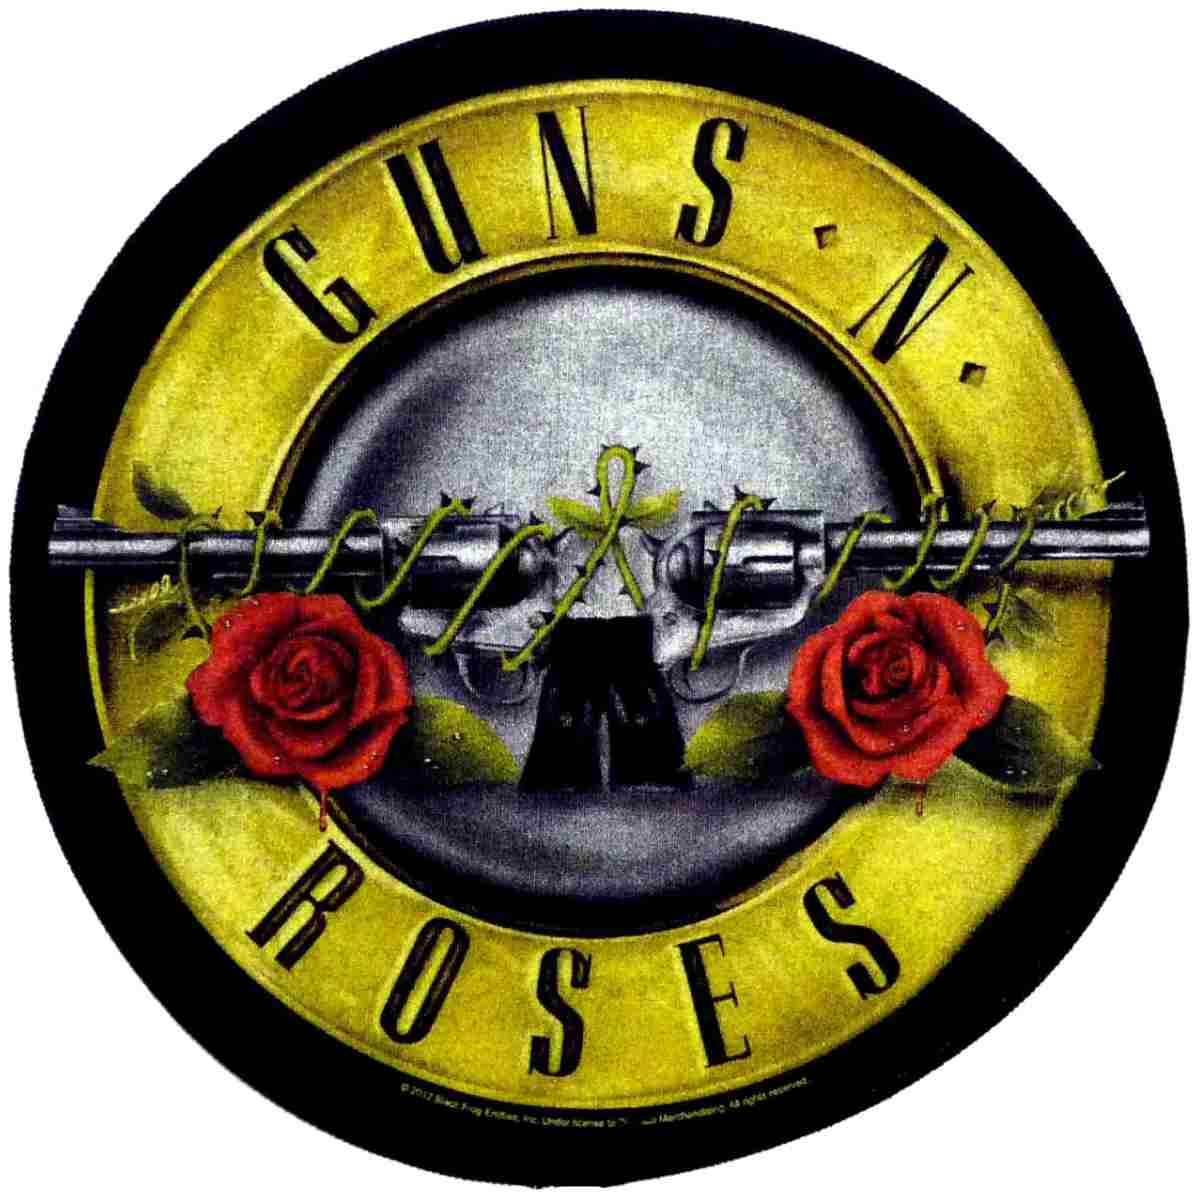 Guns n roses Logos